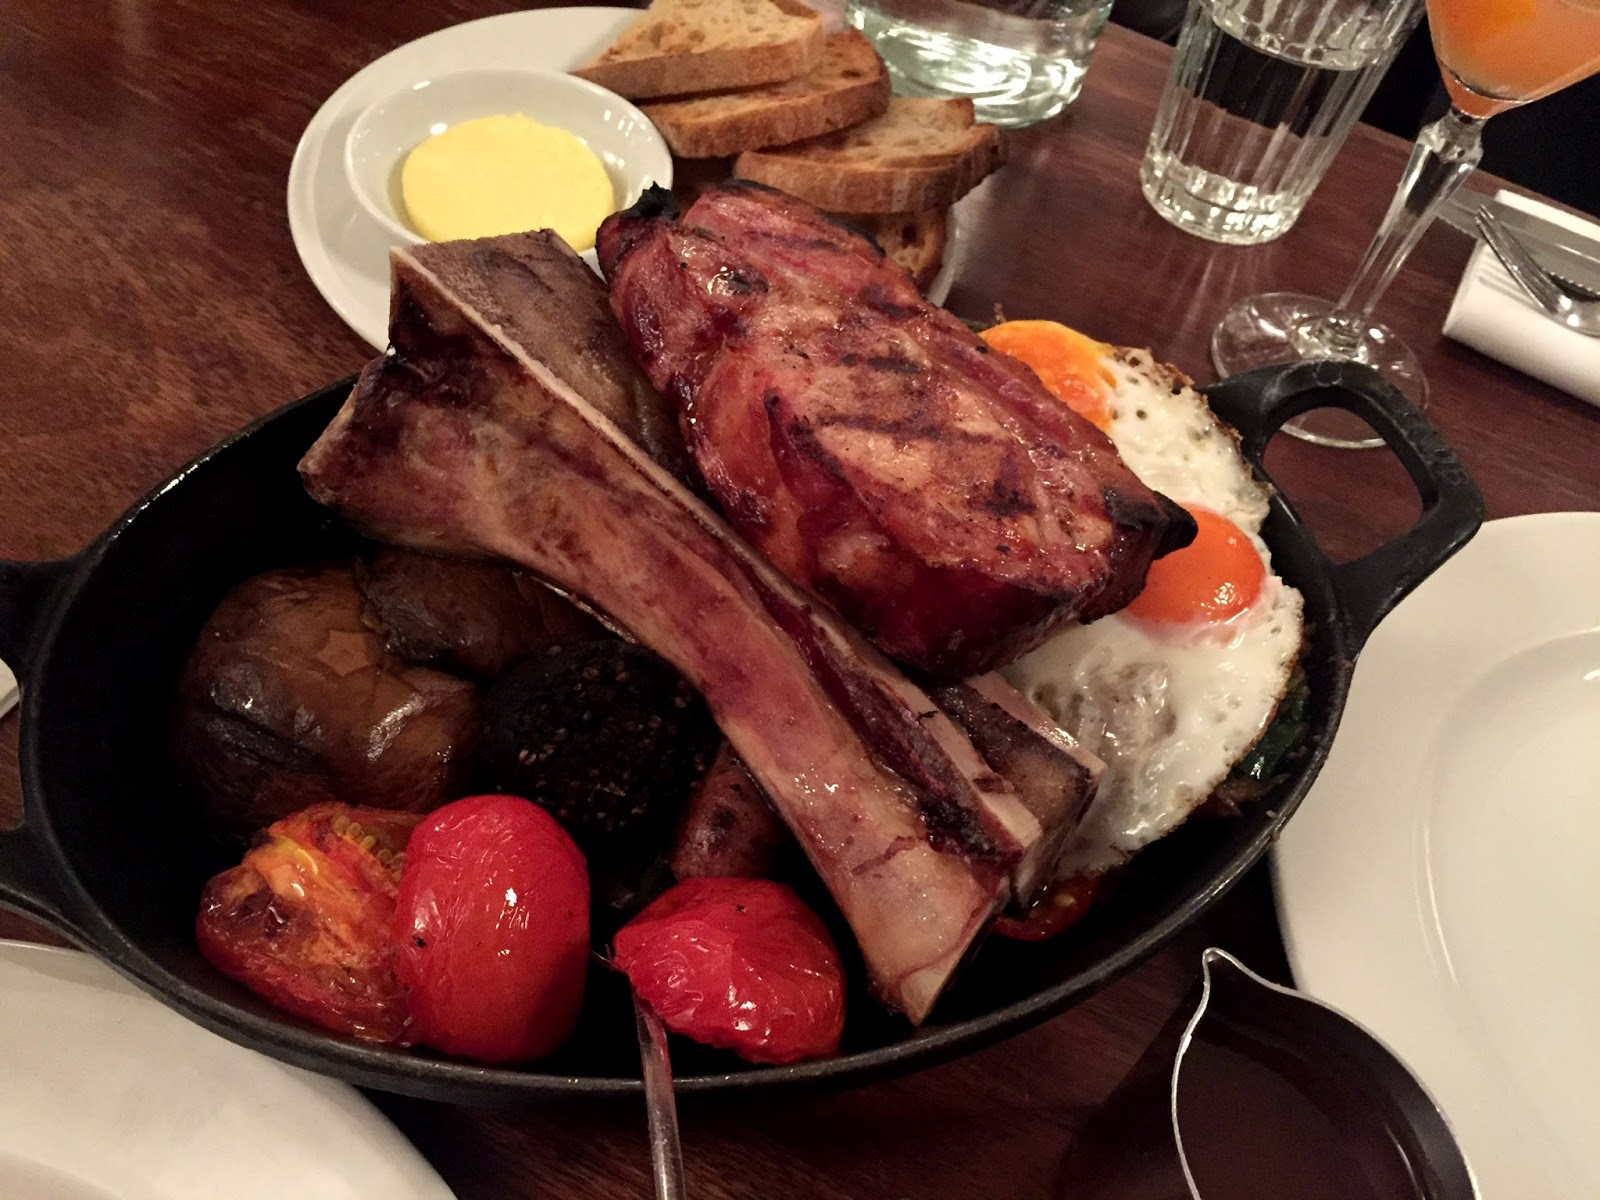 Full english breakfast on plate